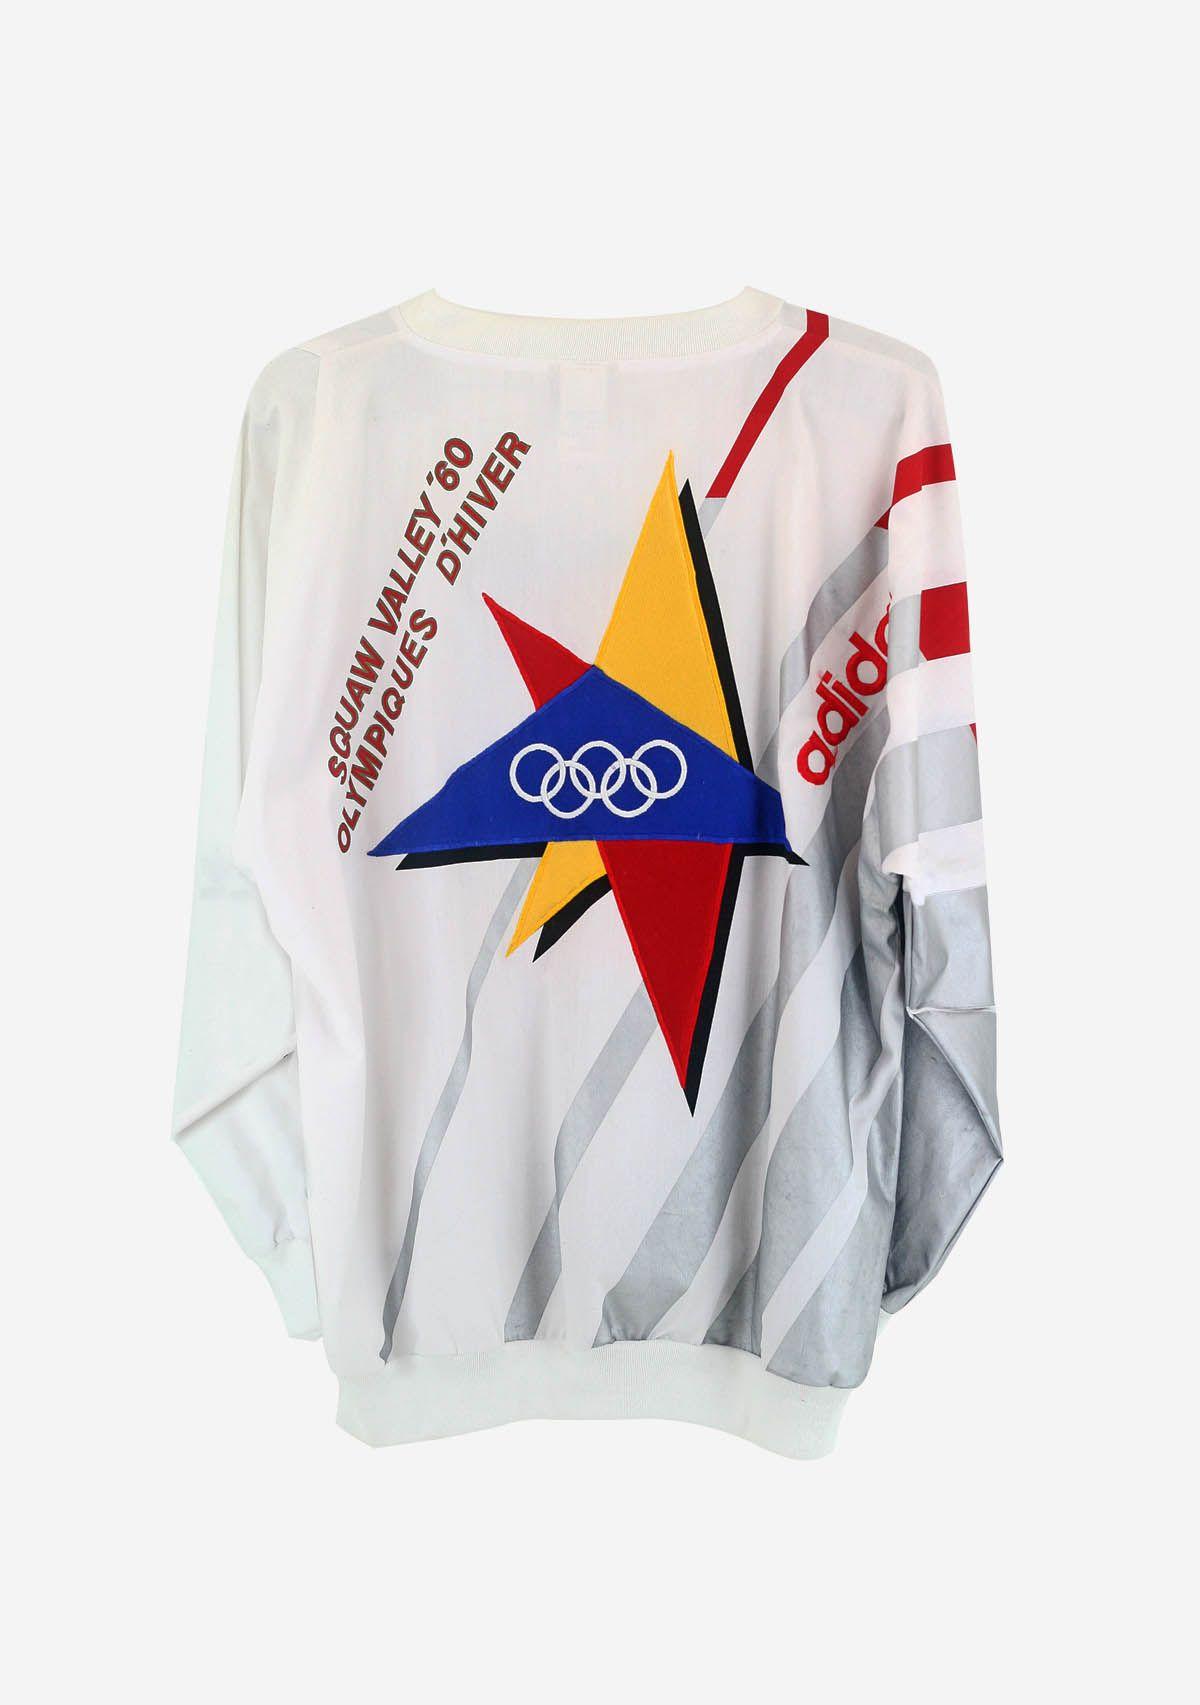 17af721a8 Adidas St Moritz Olympics sweatshirt | print | Sweatshirts, Adidas ...